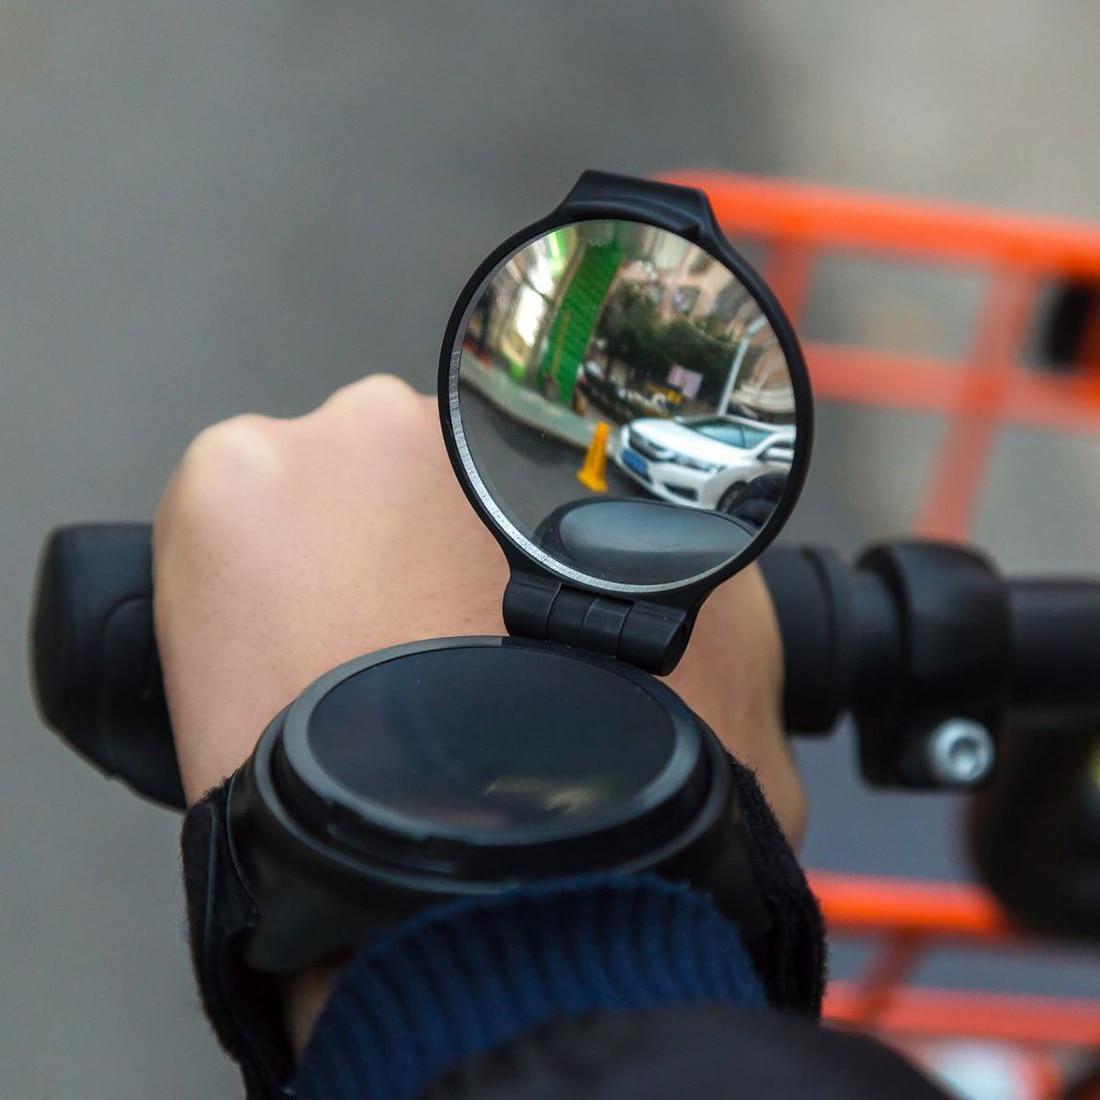 Bike Mirrors Hand Bicycle bike accessories 360 Degree Rotatable Back Mirror Arm Wrist Strap Rearview Mirror accesorios bicicleta